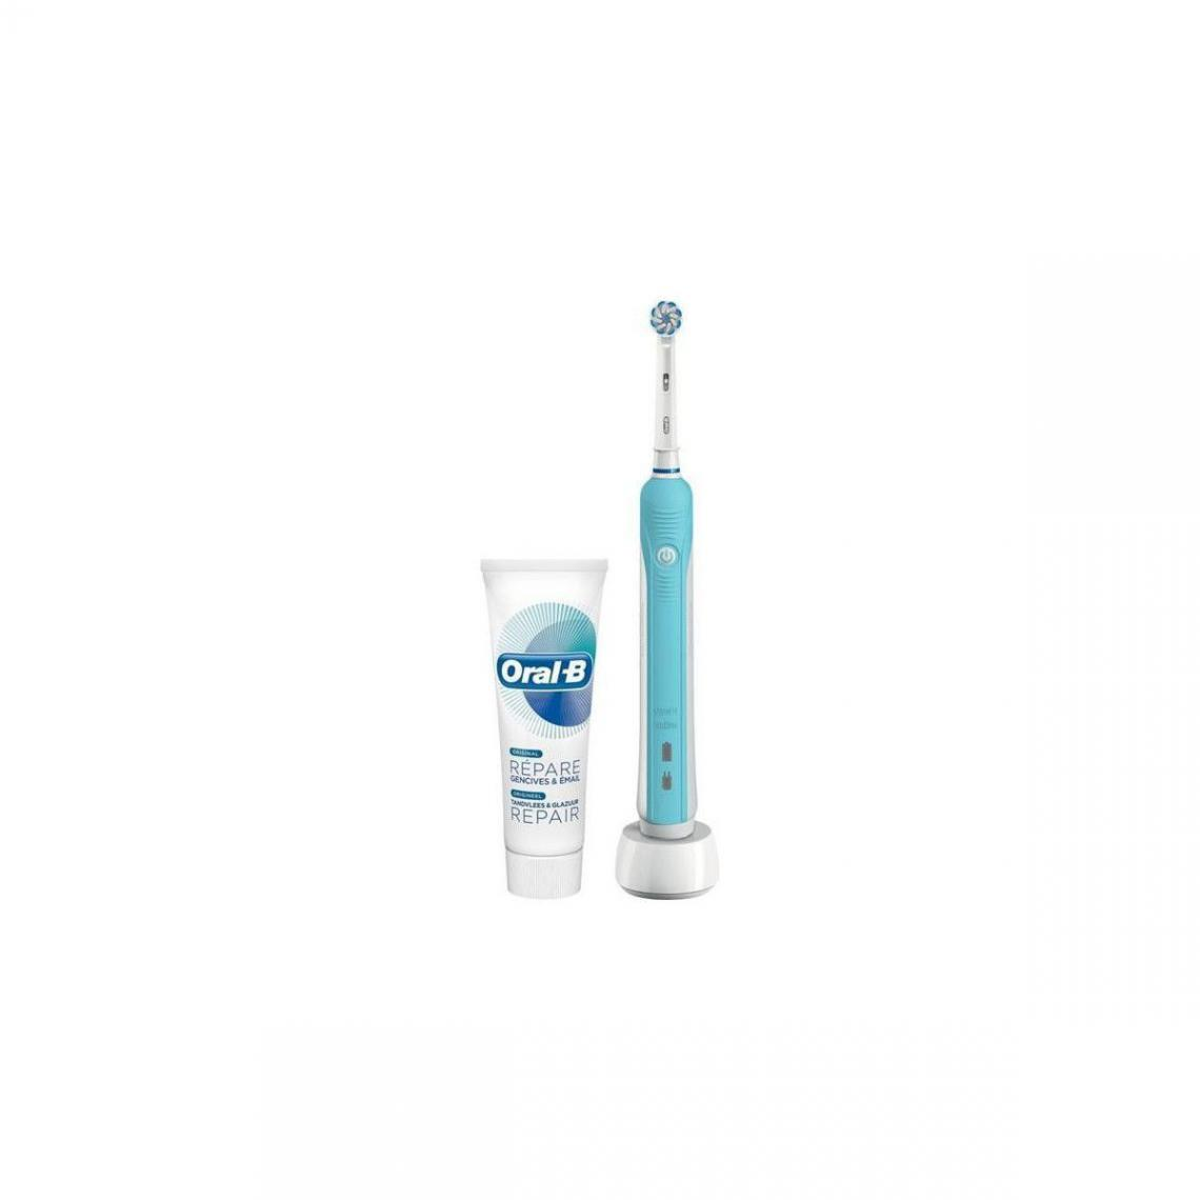 Oral-B braun - pro780